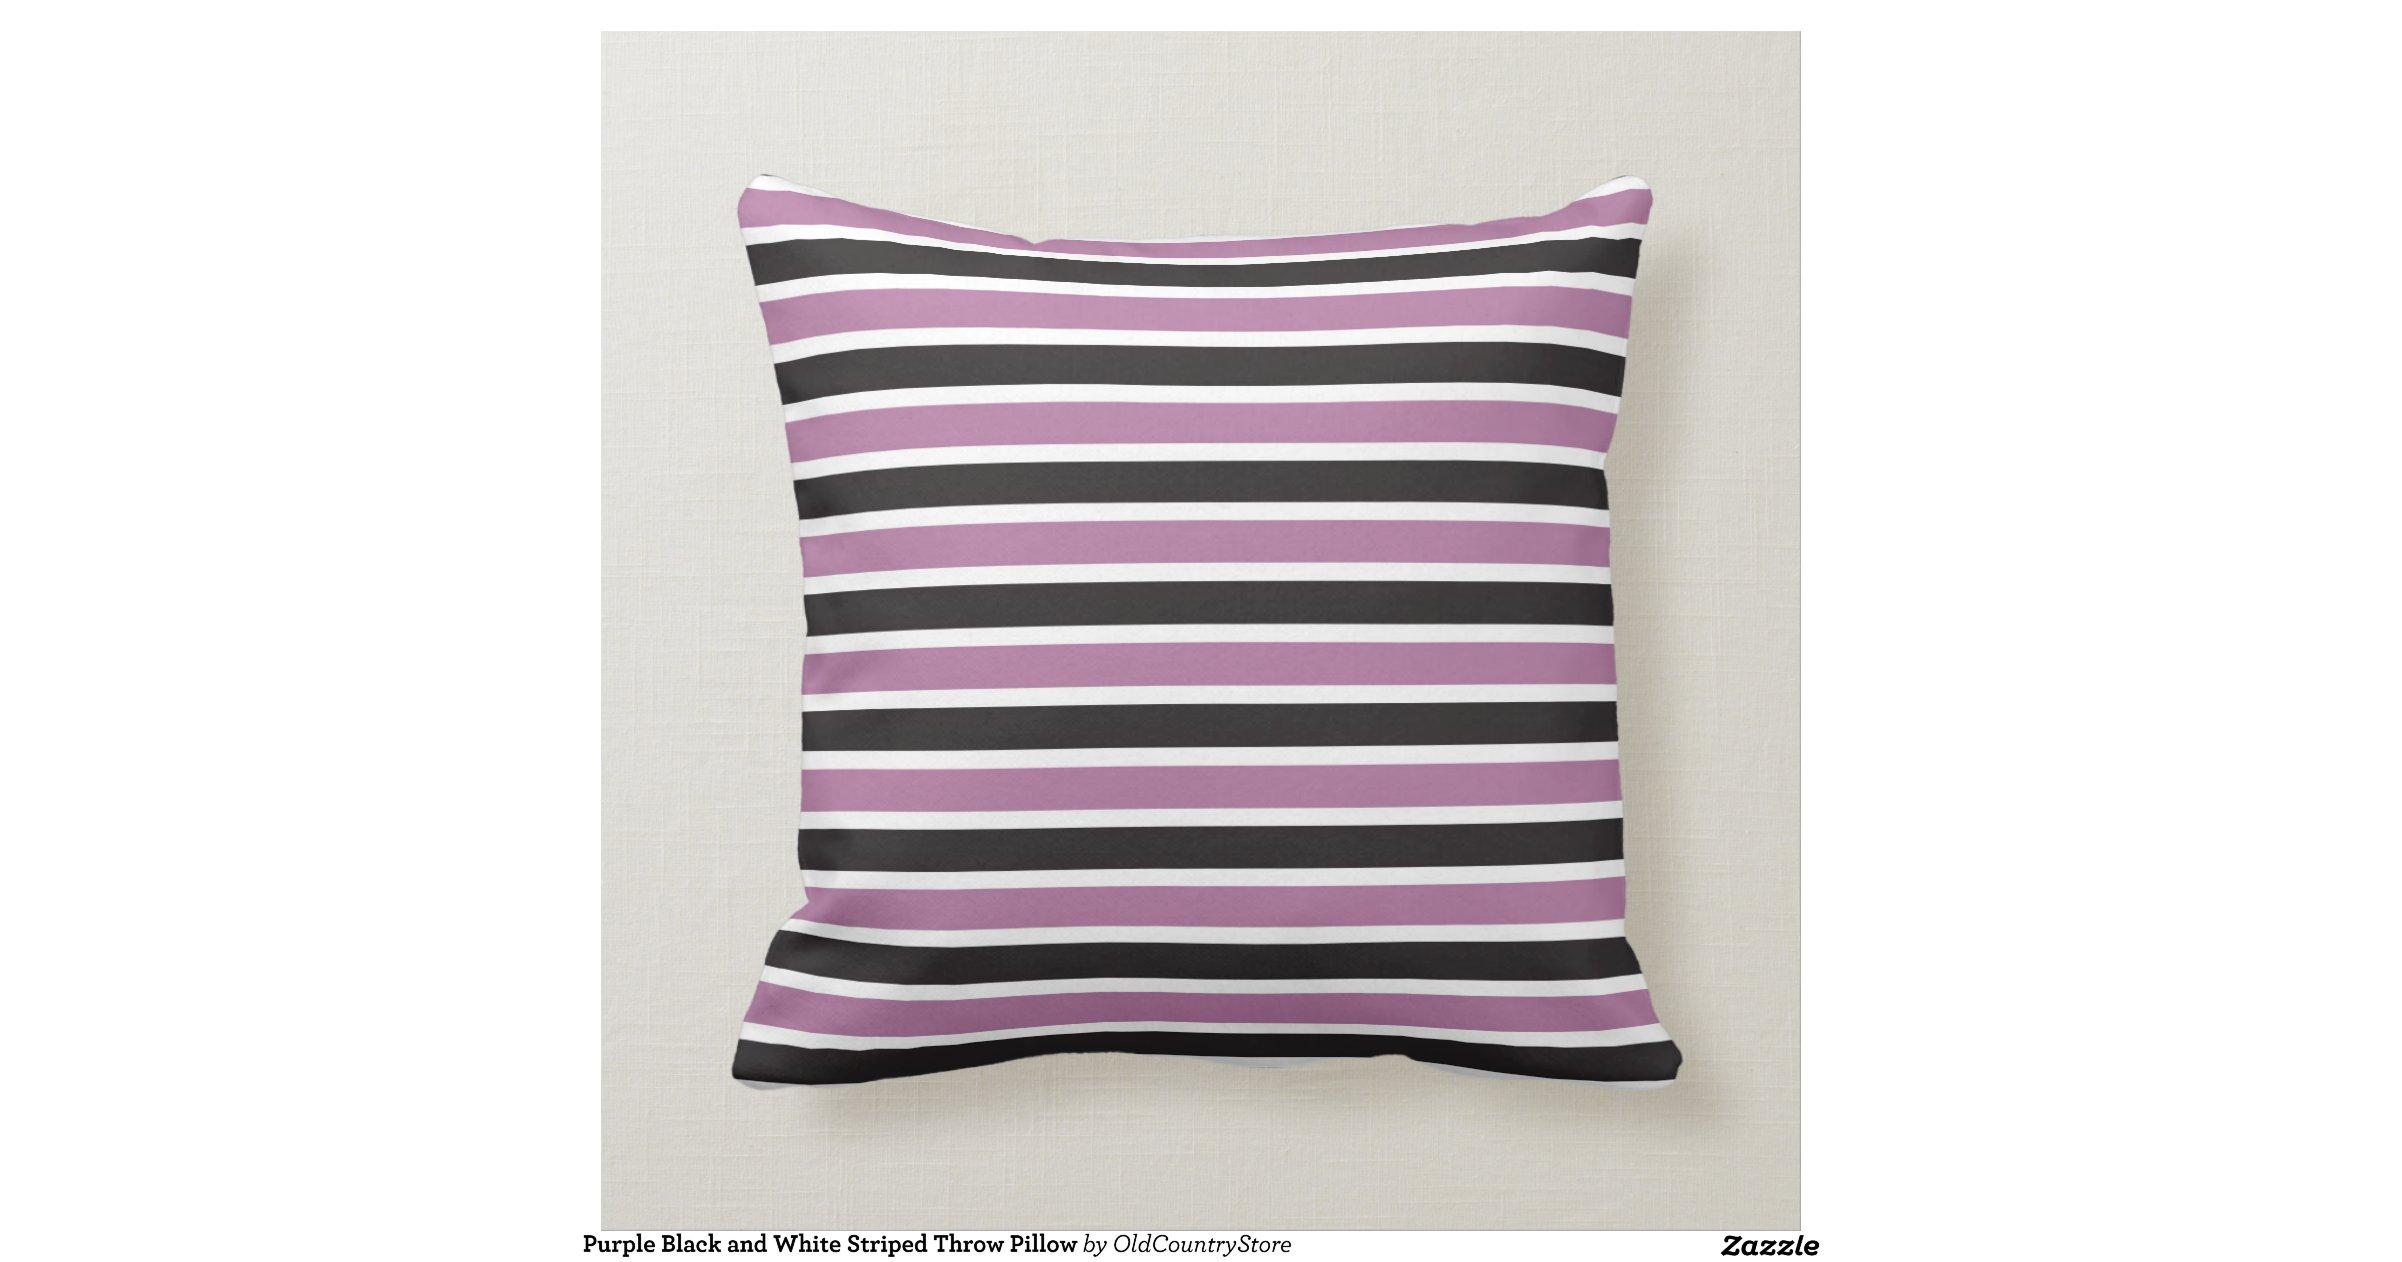 Purple Black And White Striped Throw Pillow Cushion Zazzle